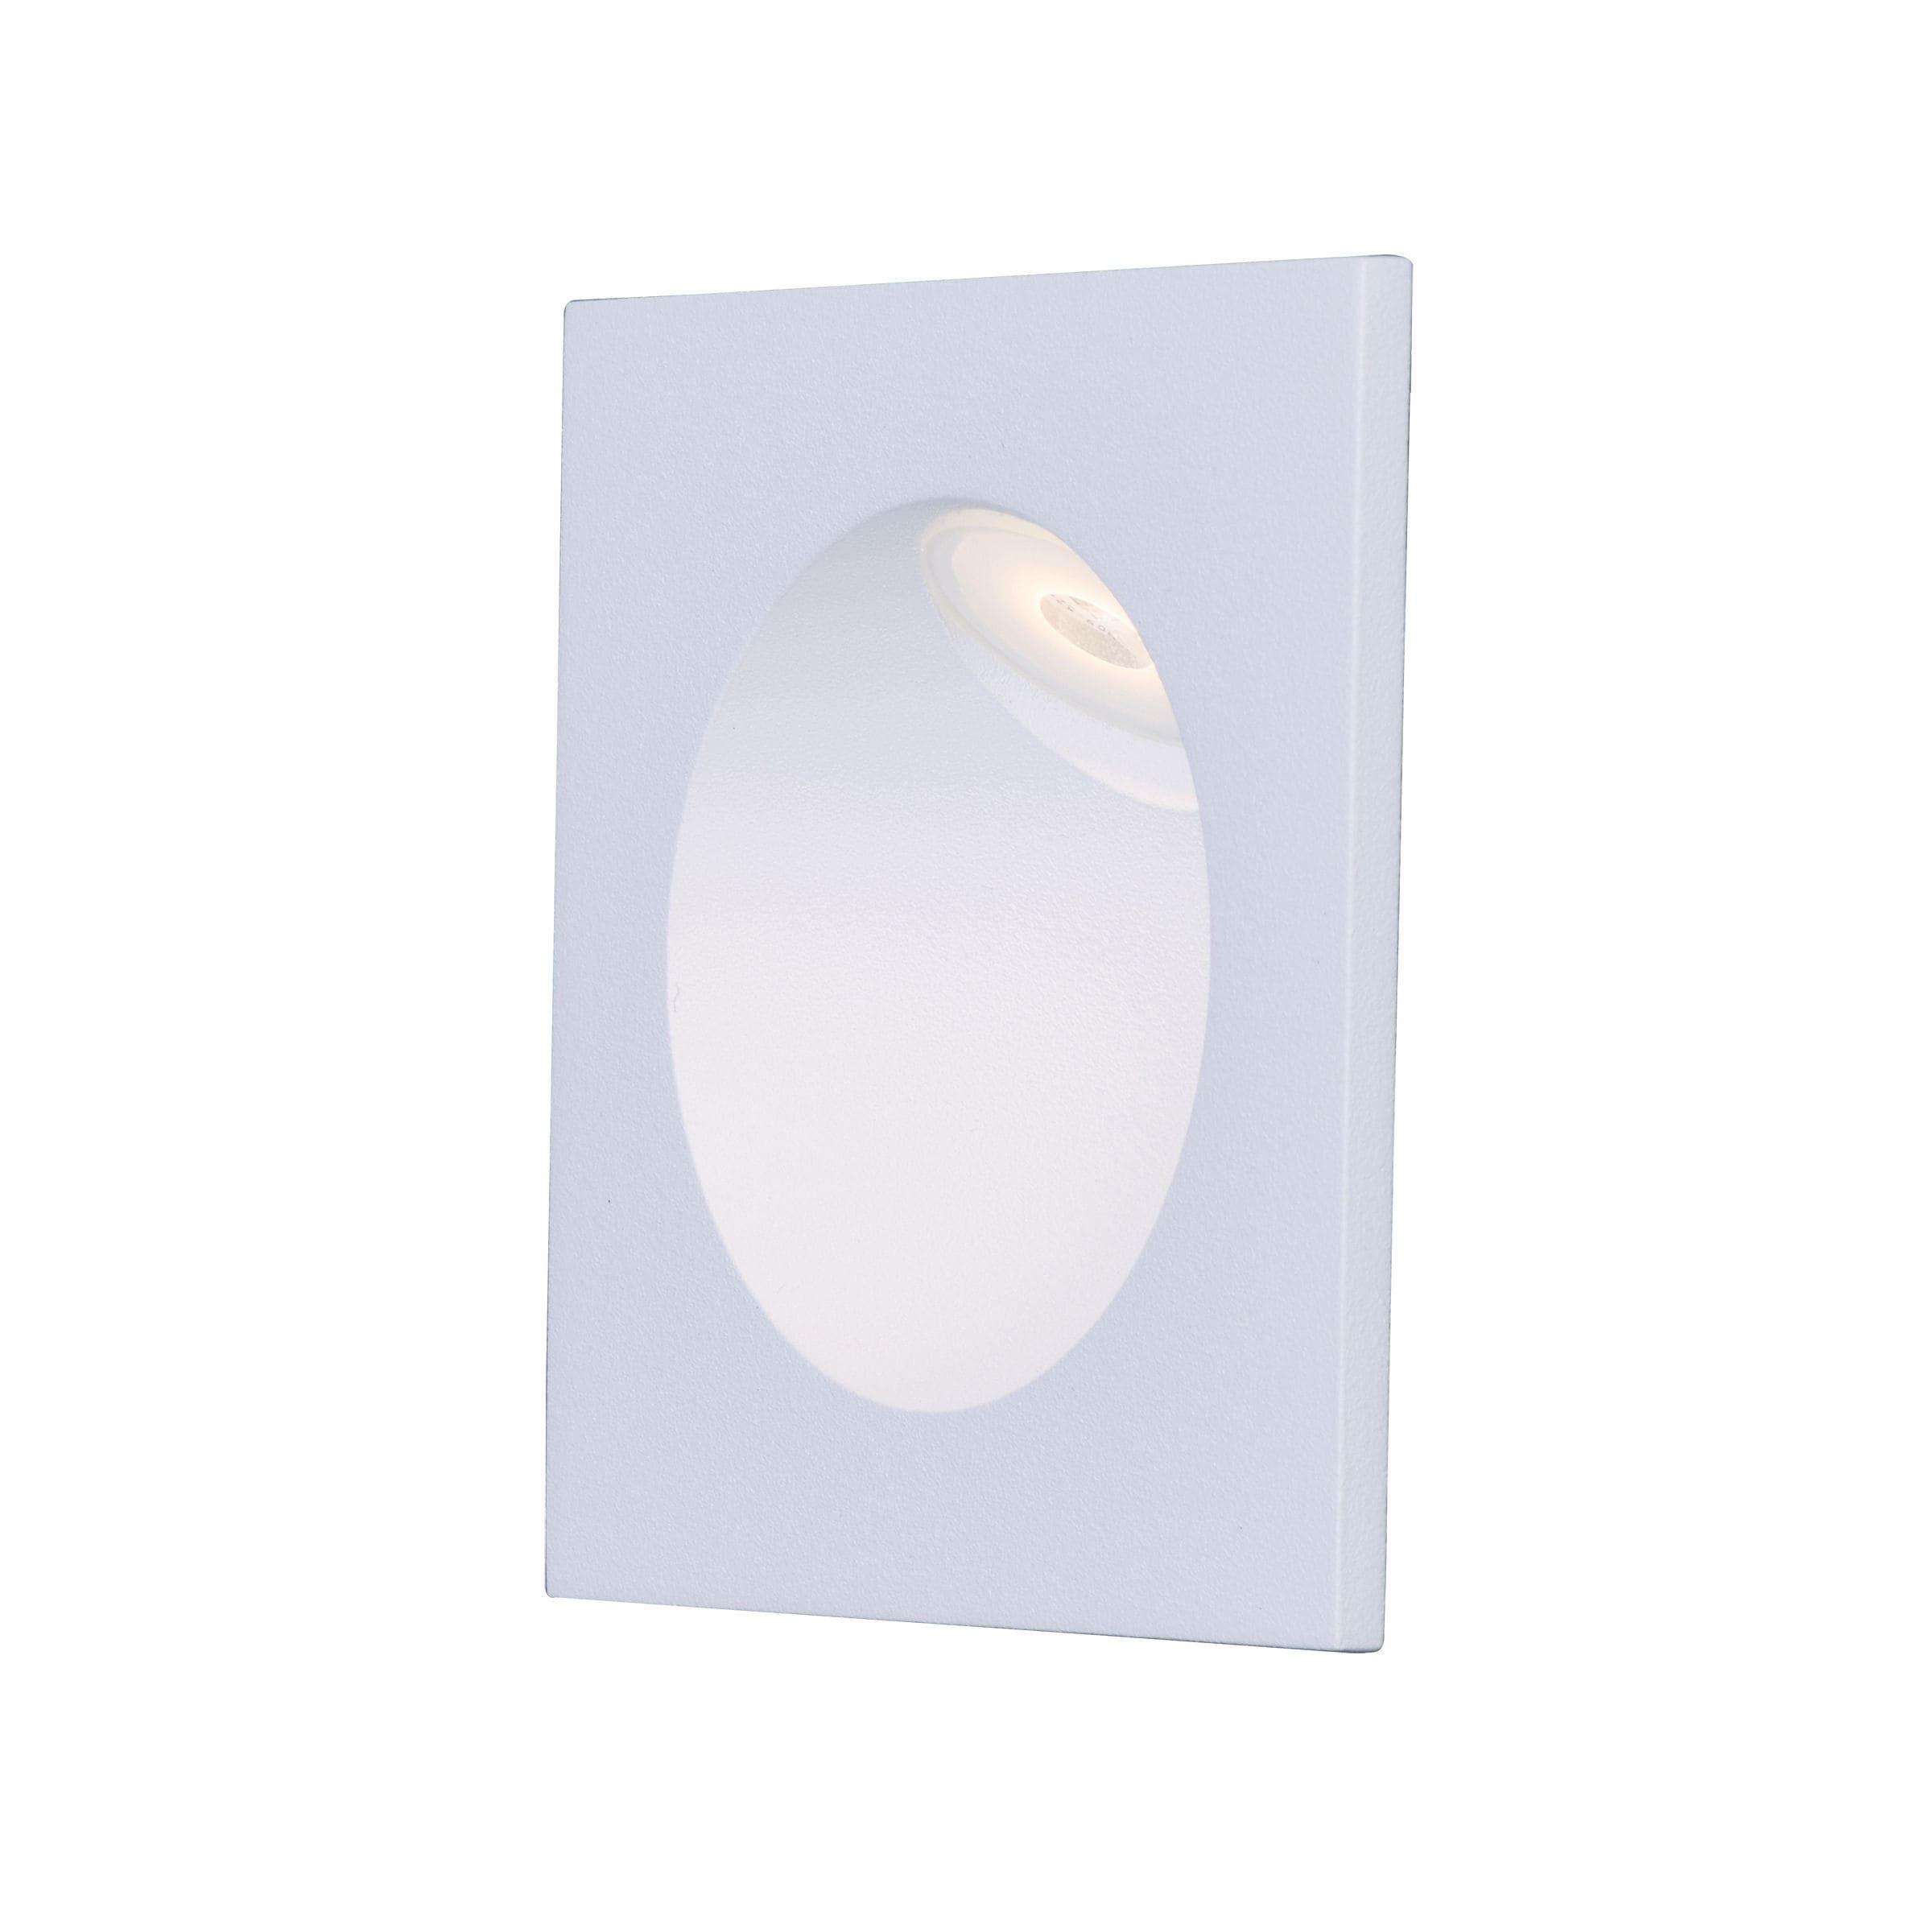 Maxim Lighting Path-Outdoor Wall Mount (White) (Aluminum)